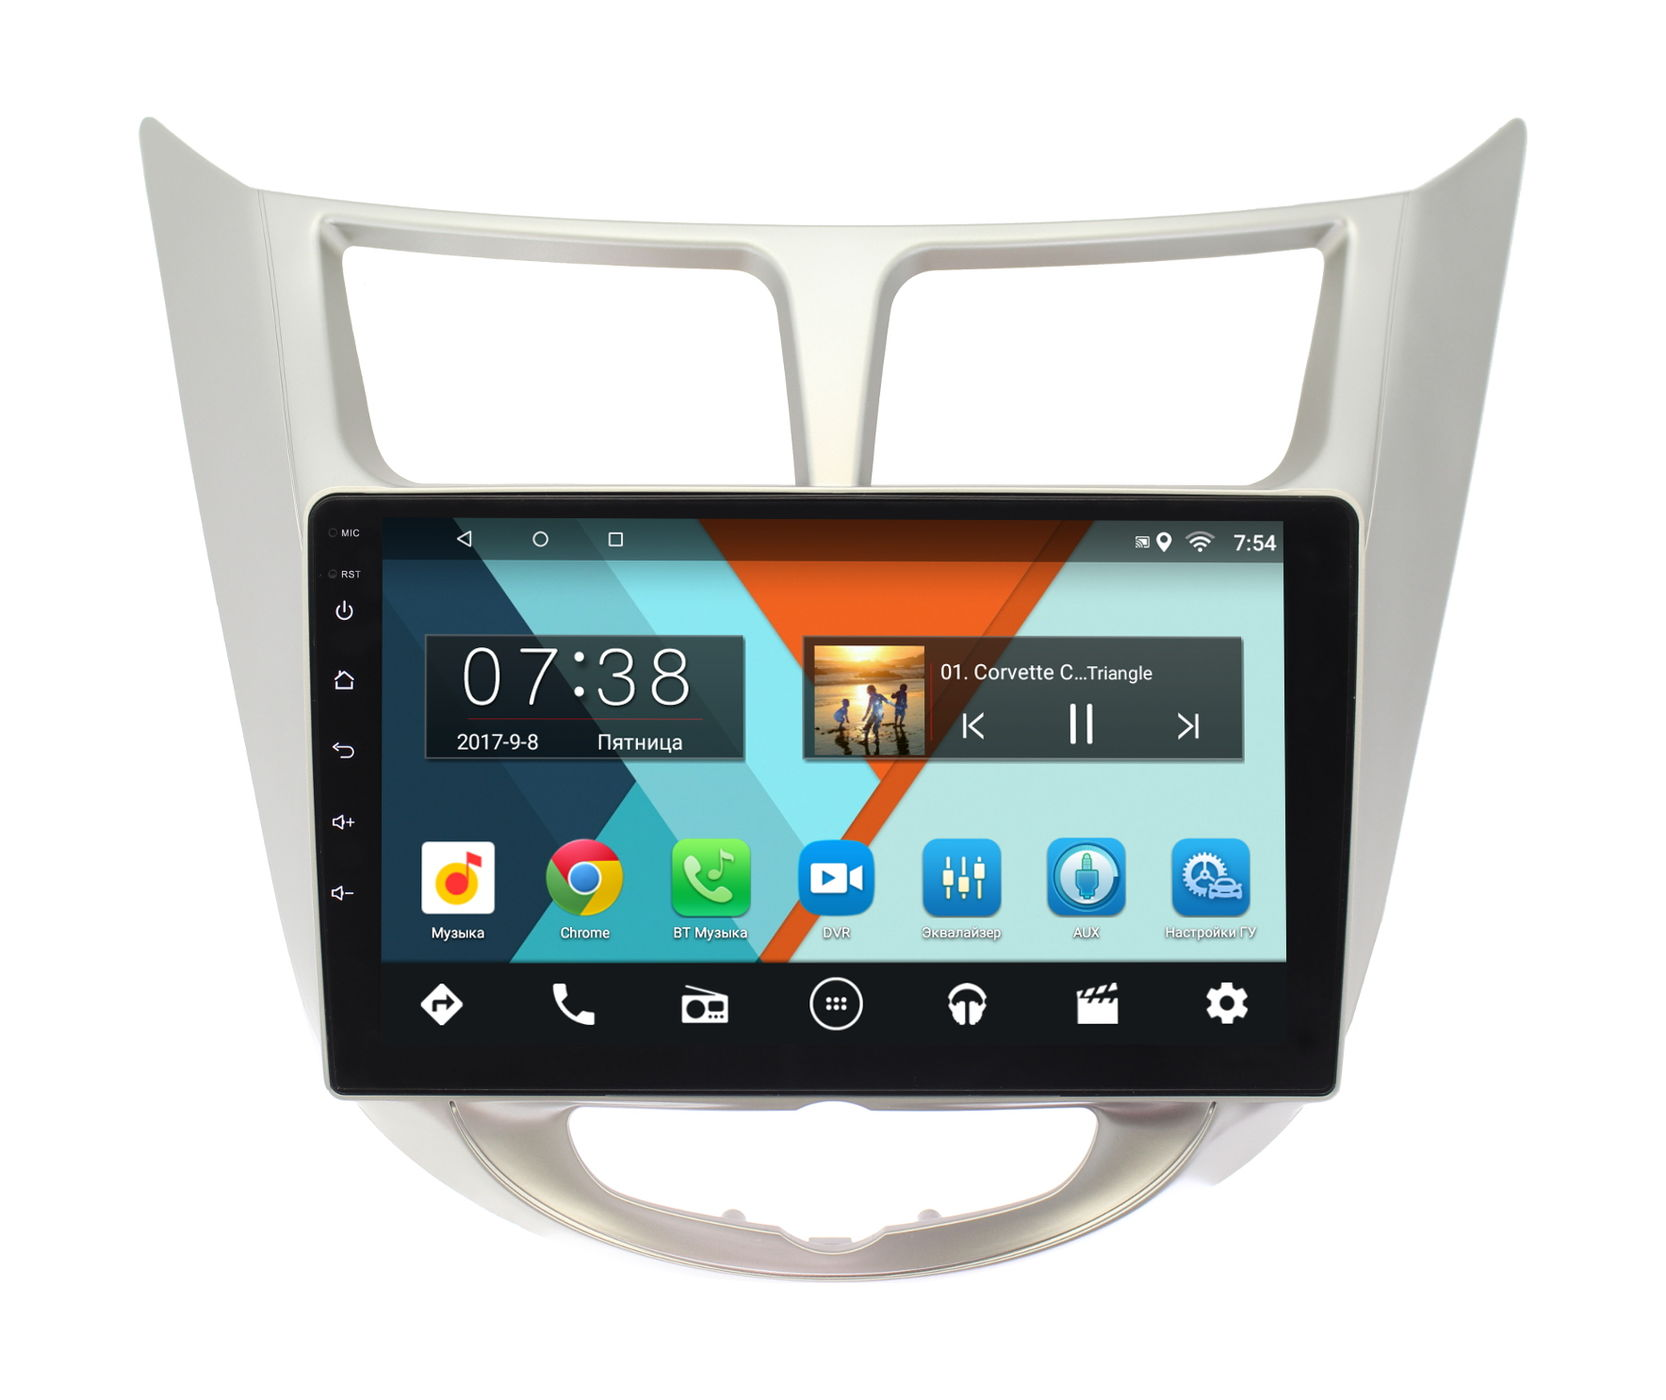 Штатная магнитола Wide Media MT9027MF для Hyundai Solaris I 2011-2017 на Android 6.0.1 motorcycle accessories short brake clutch levers for yamaha mt 07 fz07 mt 09 fz09 mt 09 tracer fj 09 fj 09 red